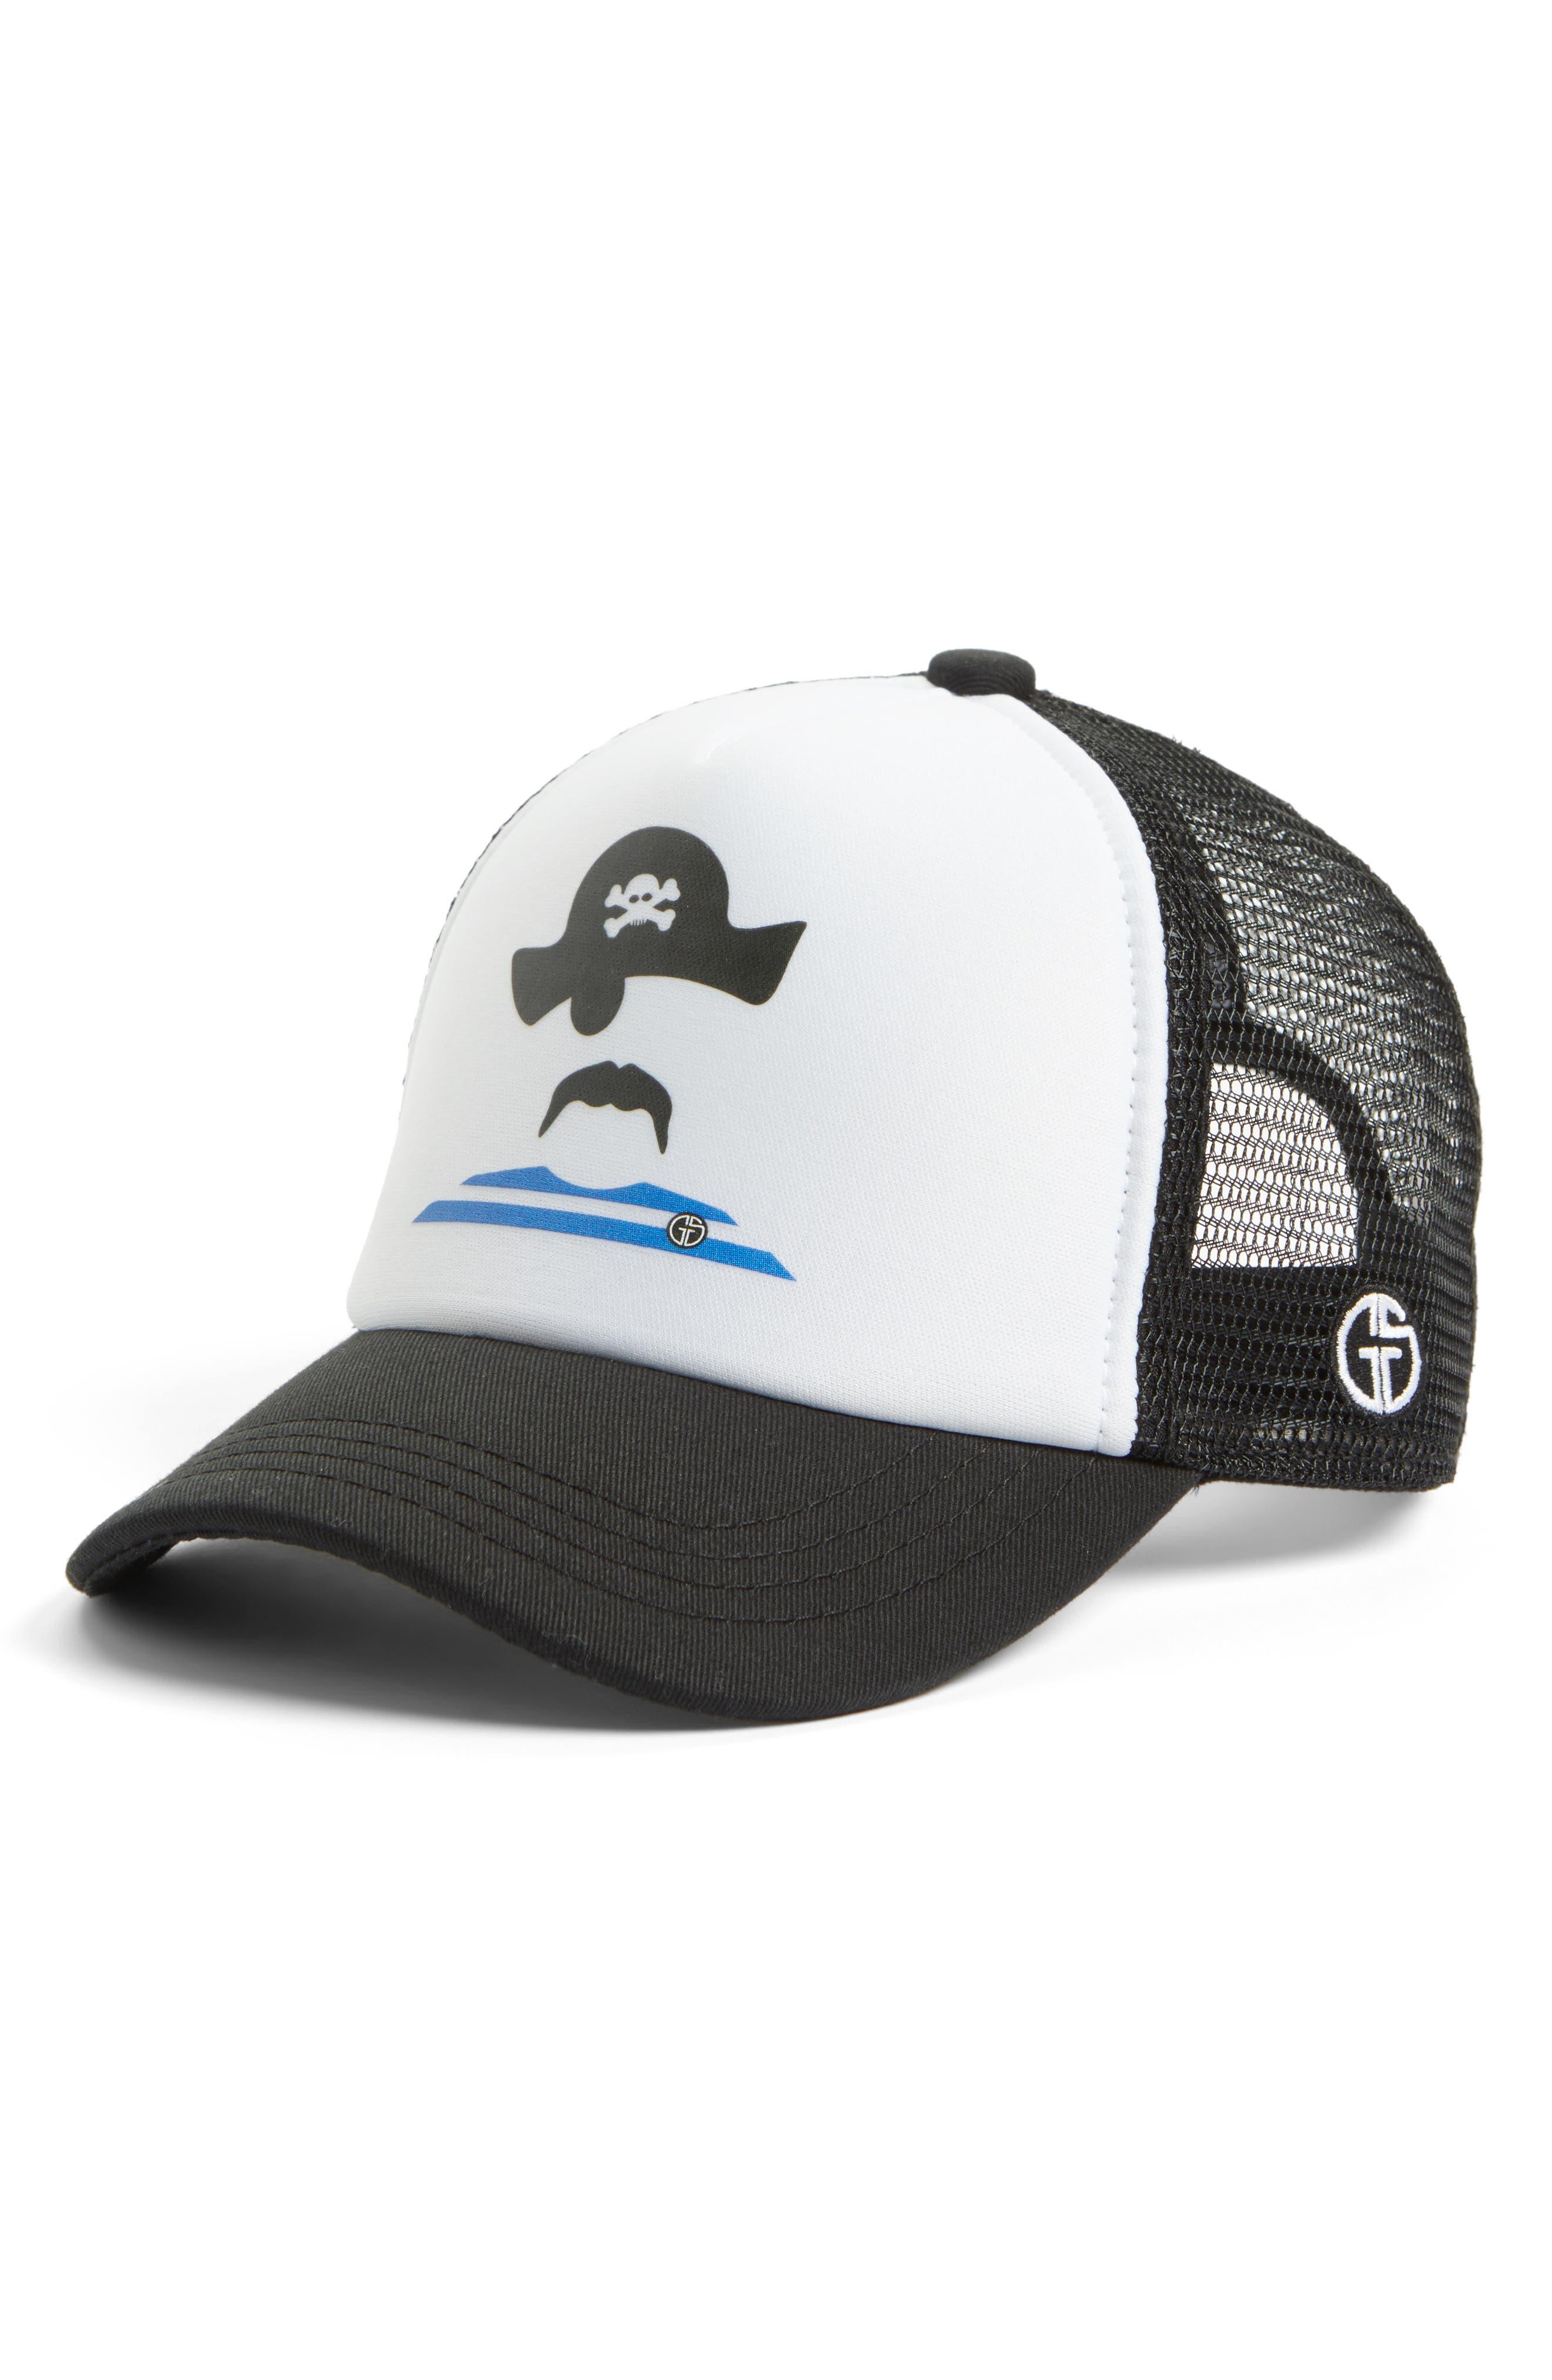 Pirate Trucker Hat,                             Main thumbnail 1, color,                             Black/ White Pirate